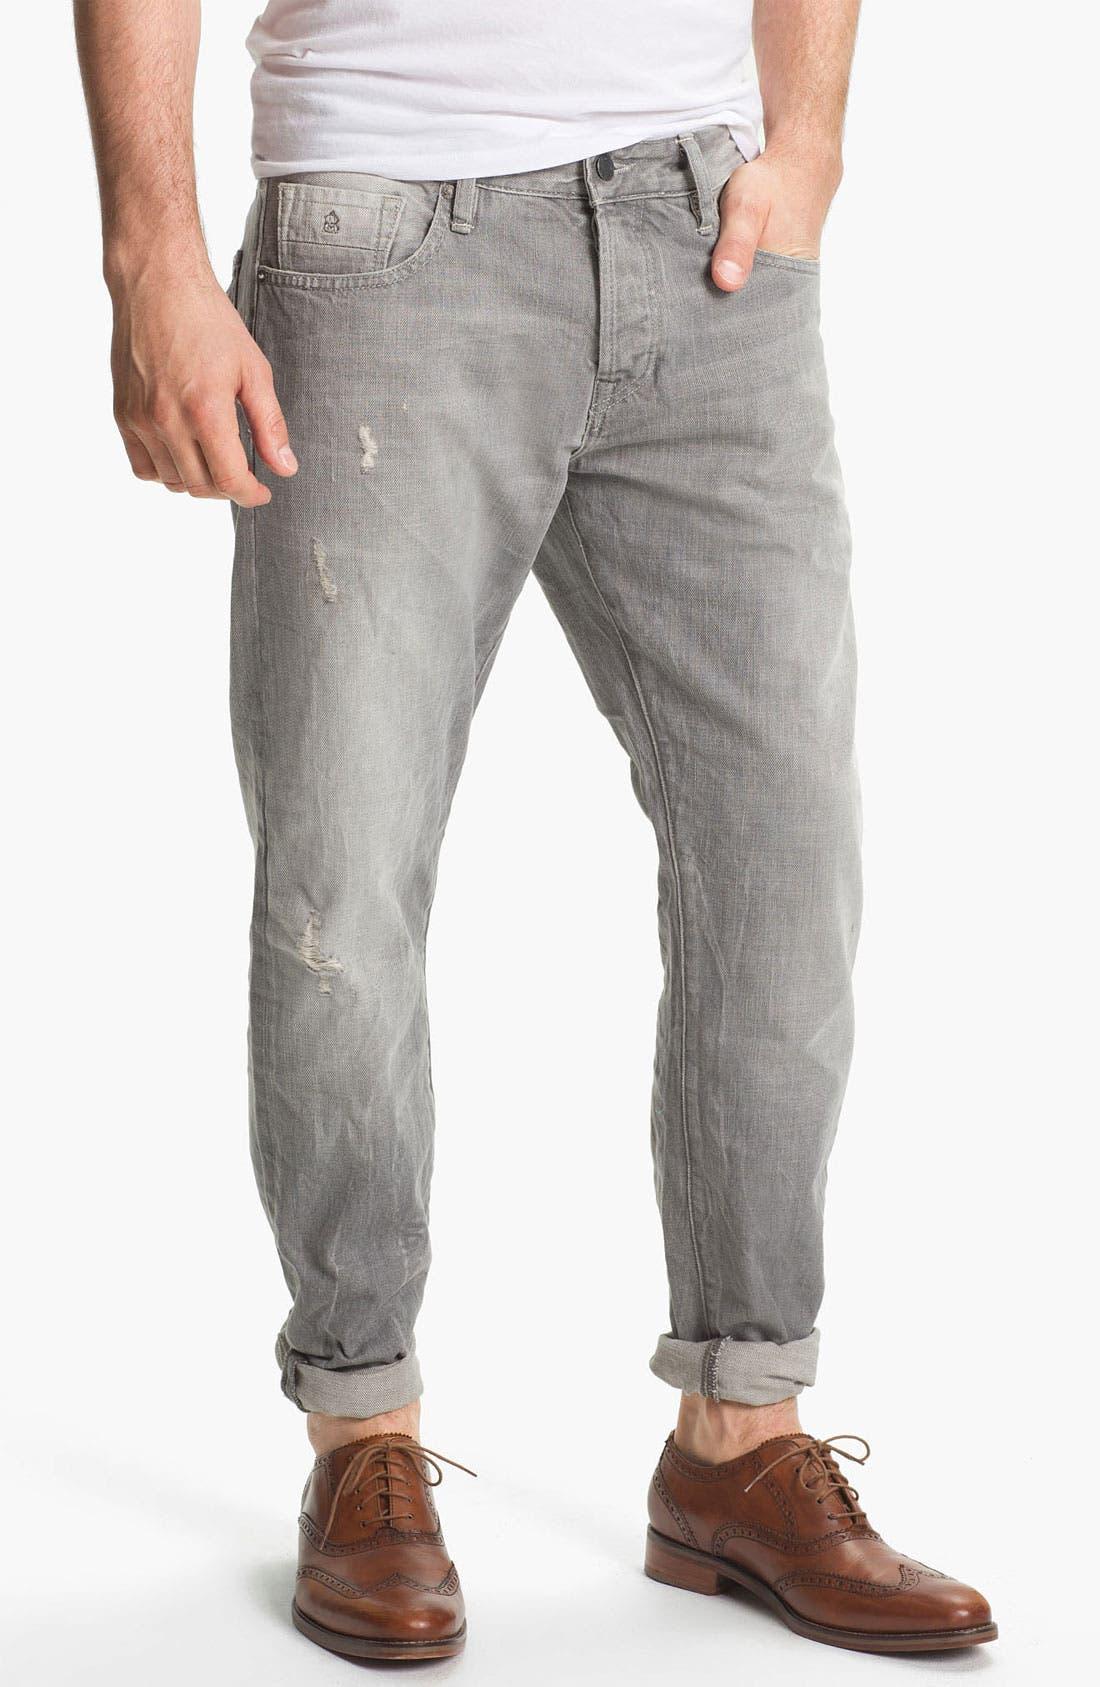 Alternate Image 1 Selected - Scotch & Soda 'Ralston' Slim Straight Leg Jeans (Stoner)